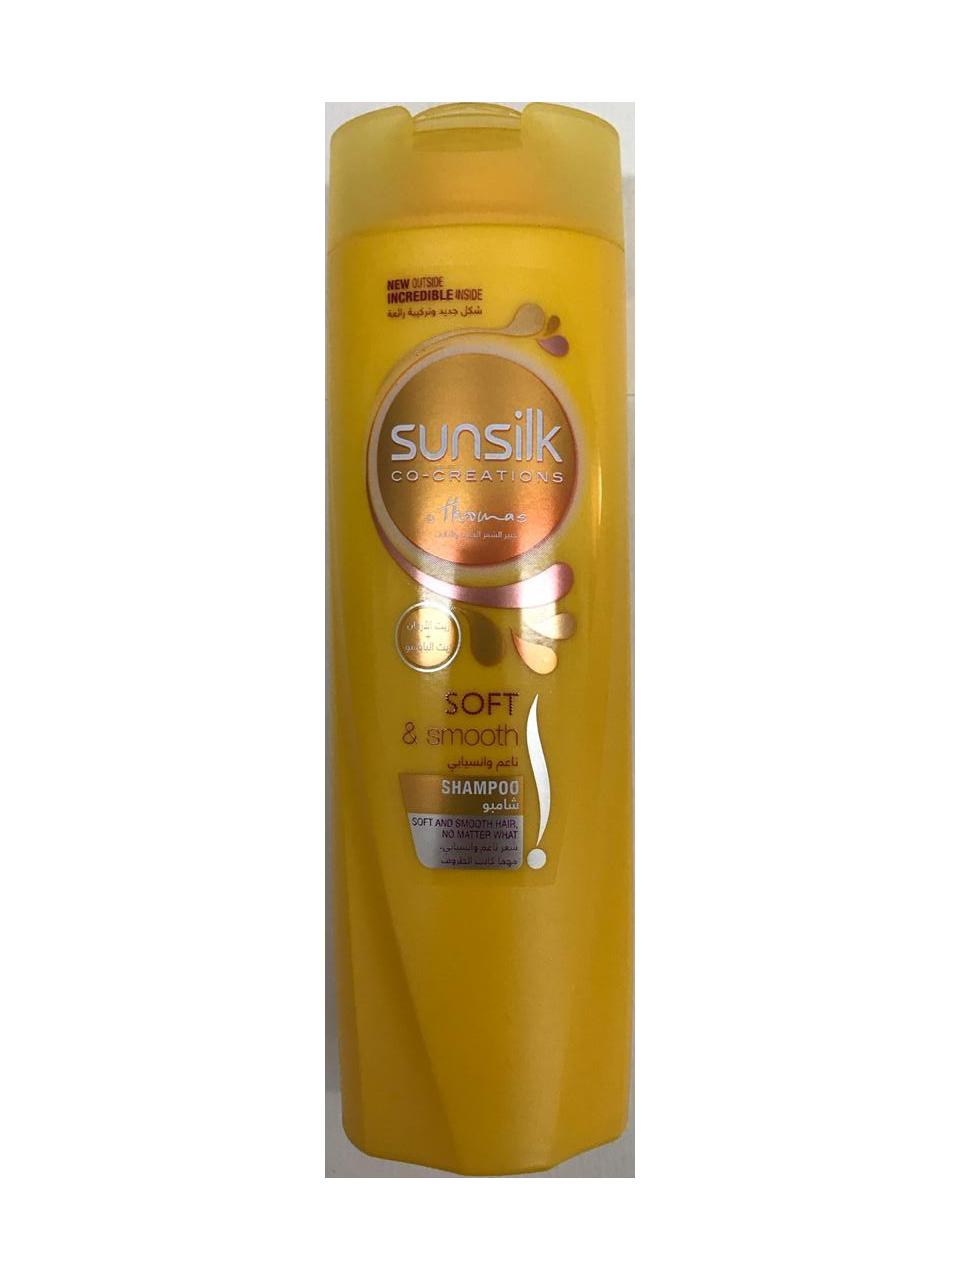 Sunsilk Soft & Smooth Shampoo 200ml